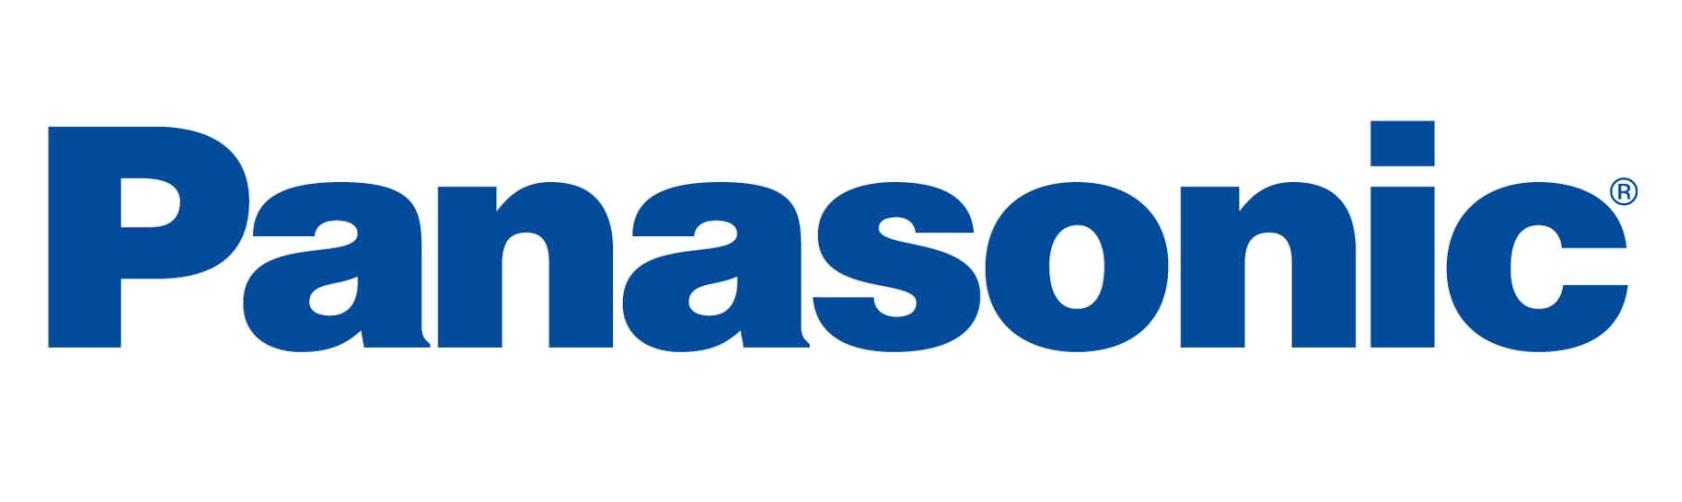 Cargadores Panasonic